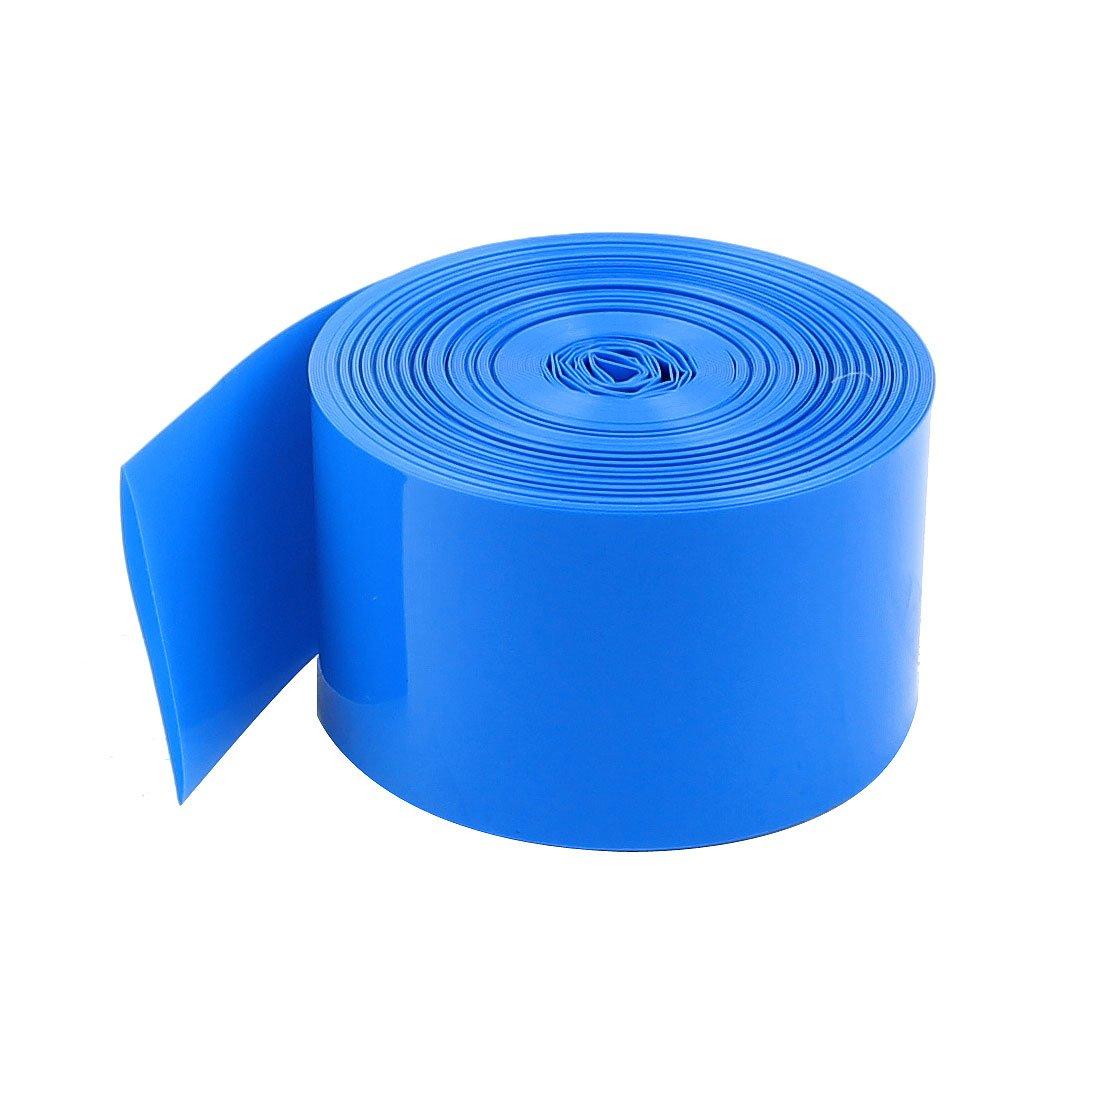 sourcingmap® 10Meters 29.5mm Width PVC Heat Shrink Wrap Blue for 1 x 18650 Battery a15012900ux0421